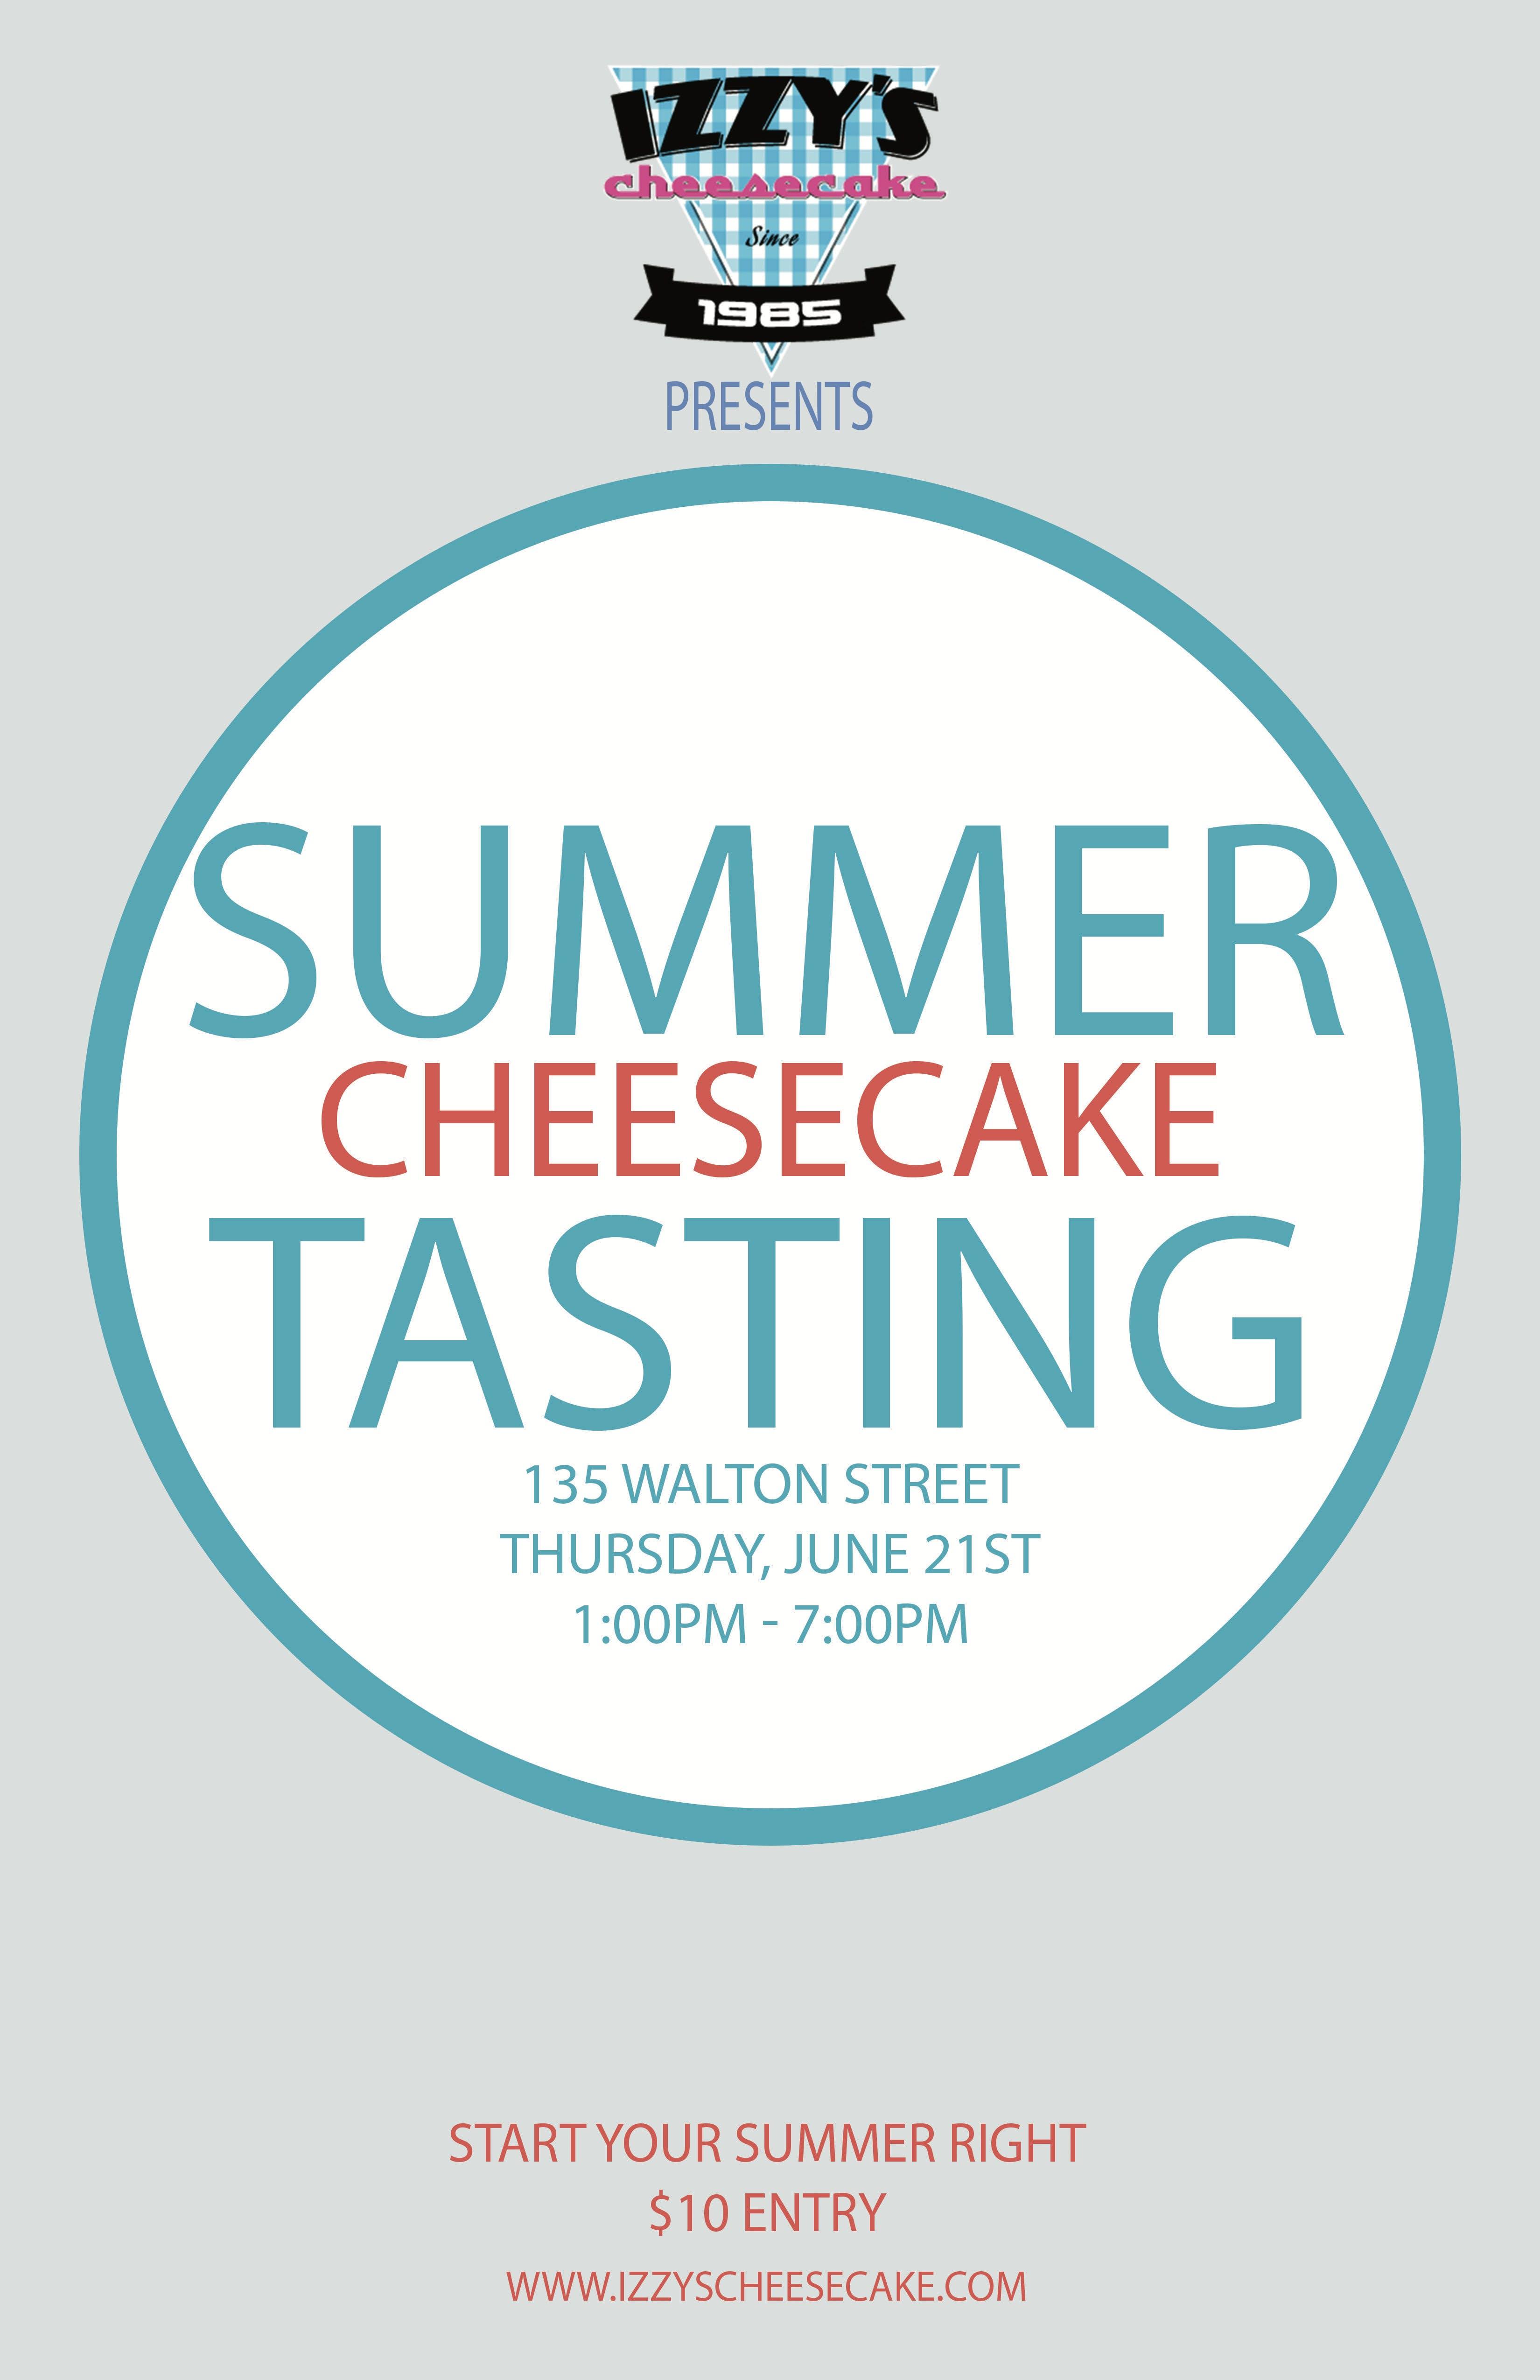 Izzy's Summer Cheesecake Tasting